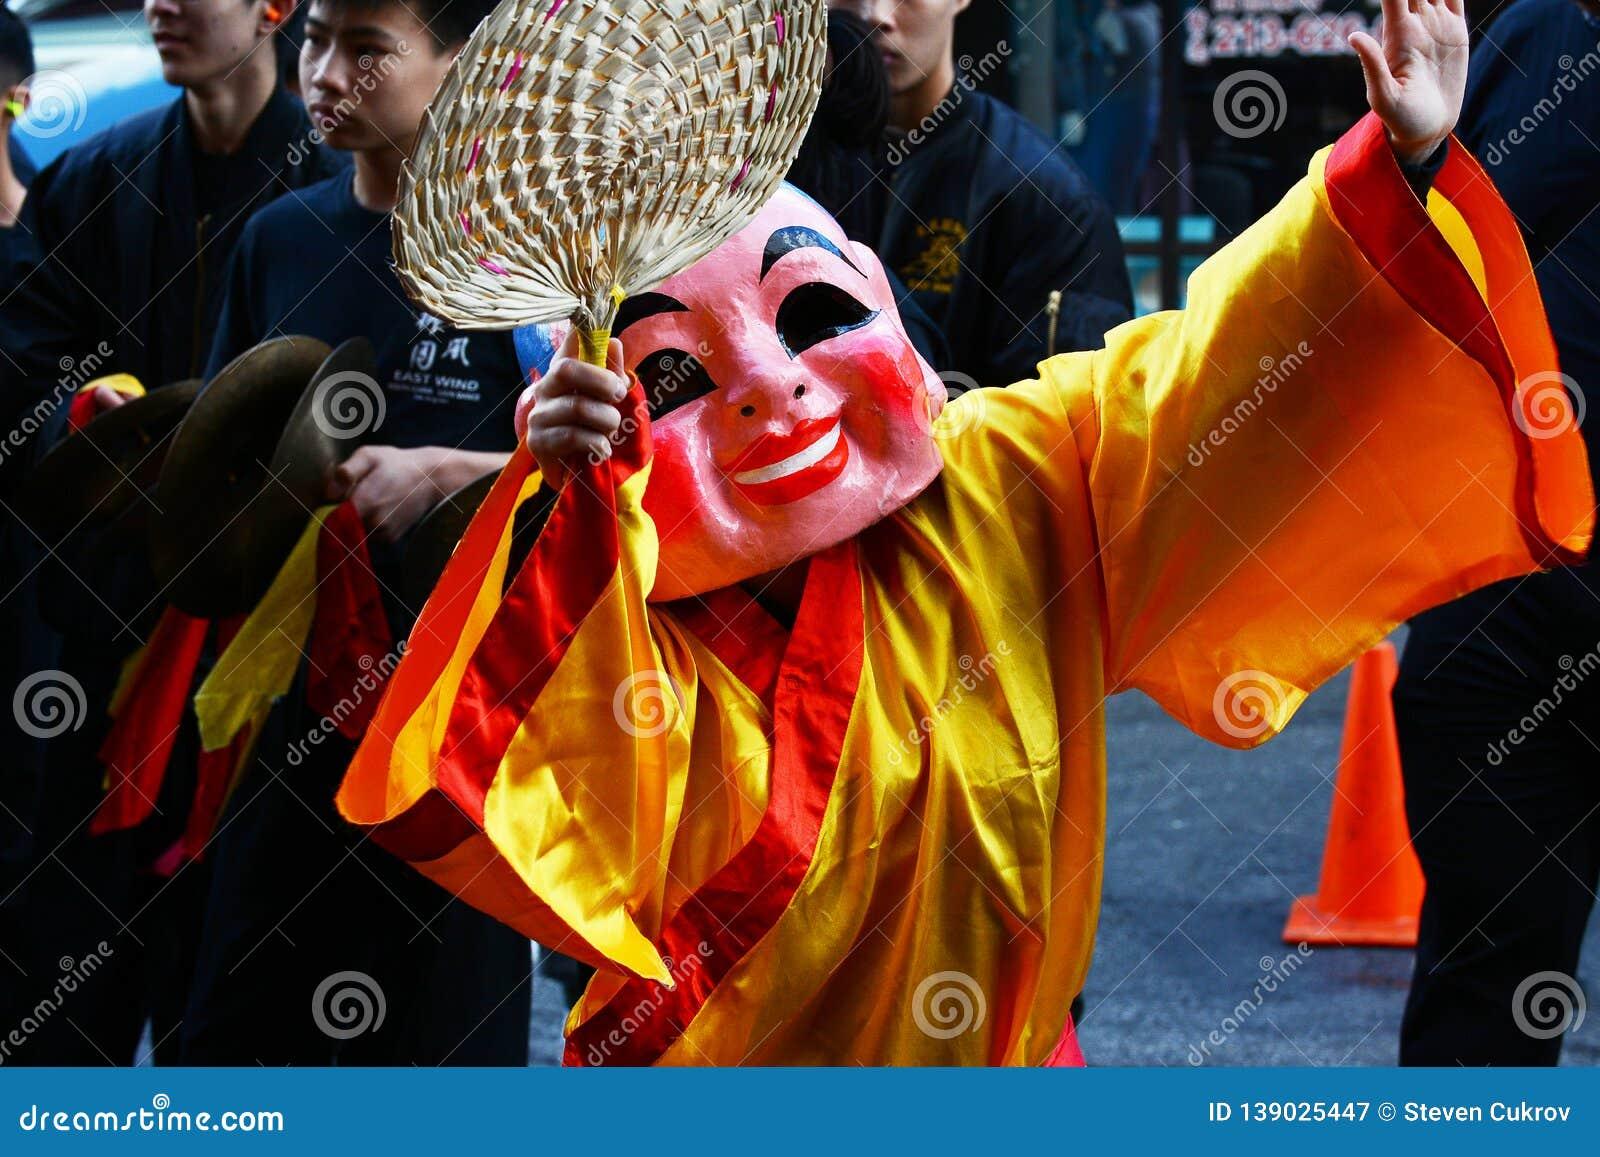 Uitvoerder in kostuum in Gouden Dragon Parade, die het Chinese Nieuwjaar vieren